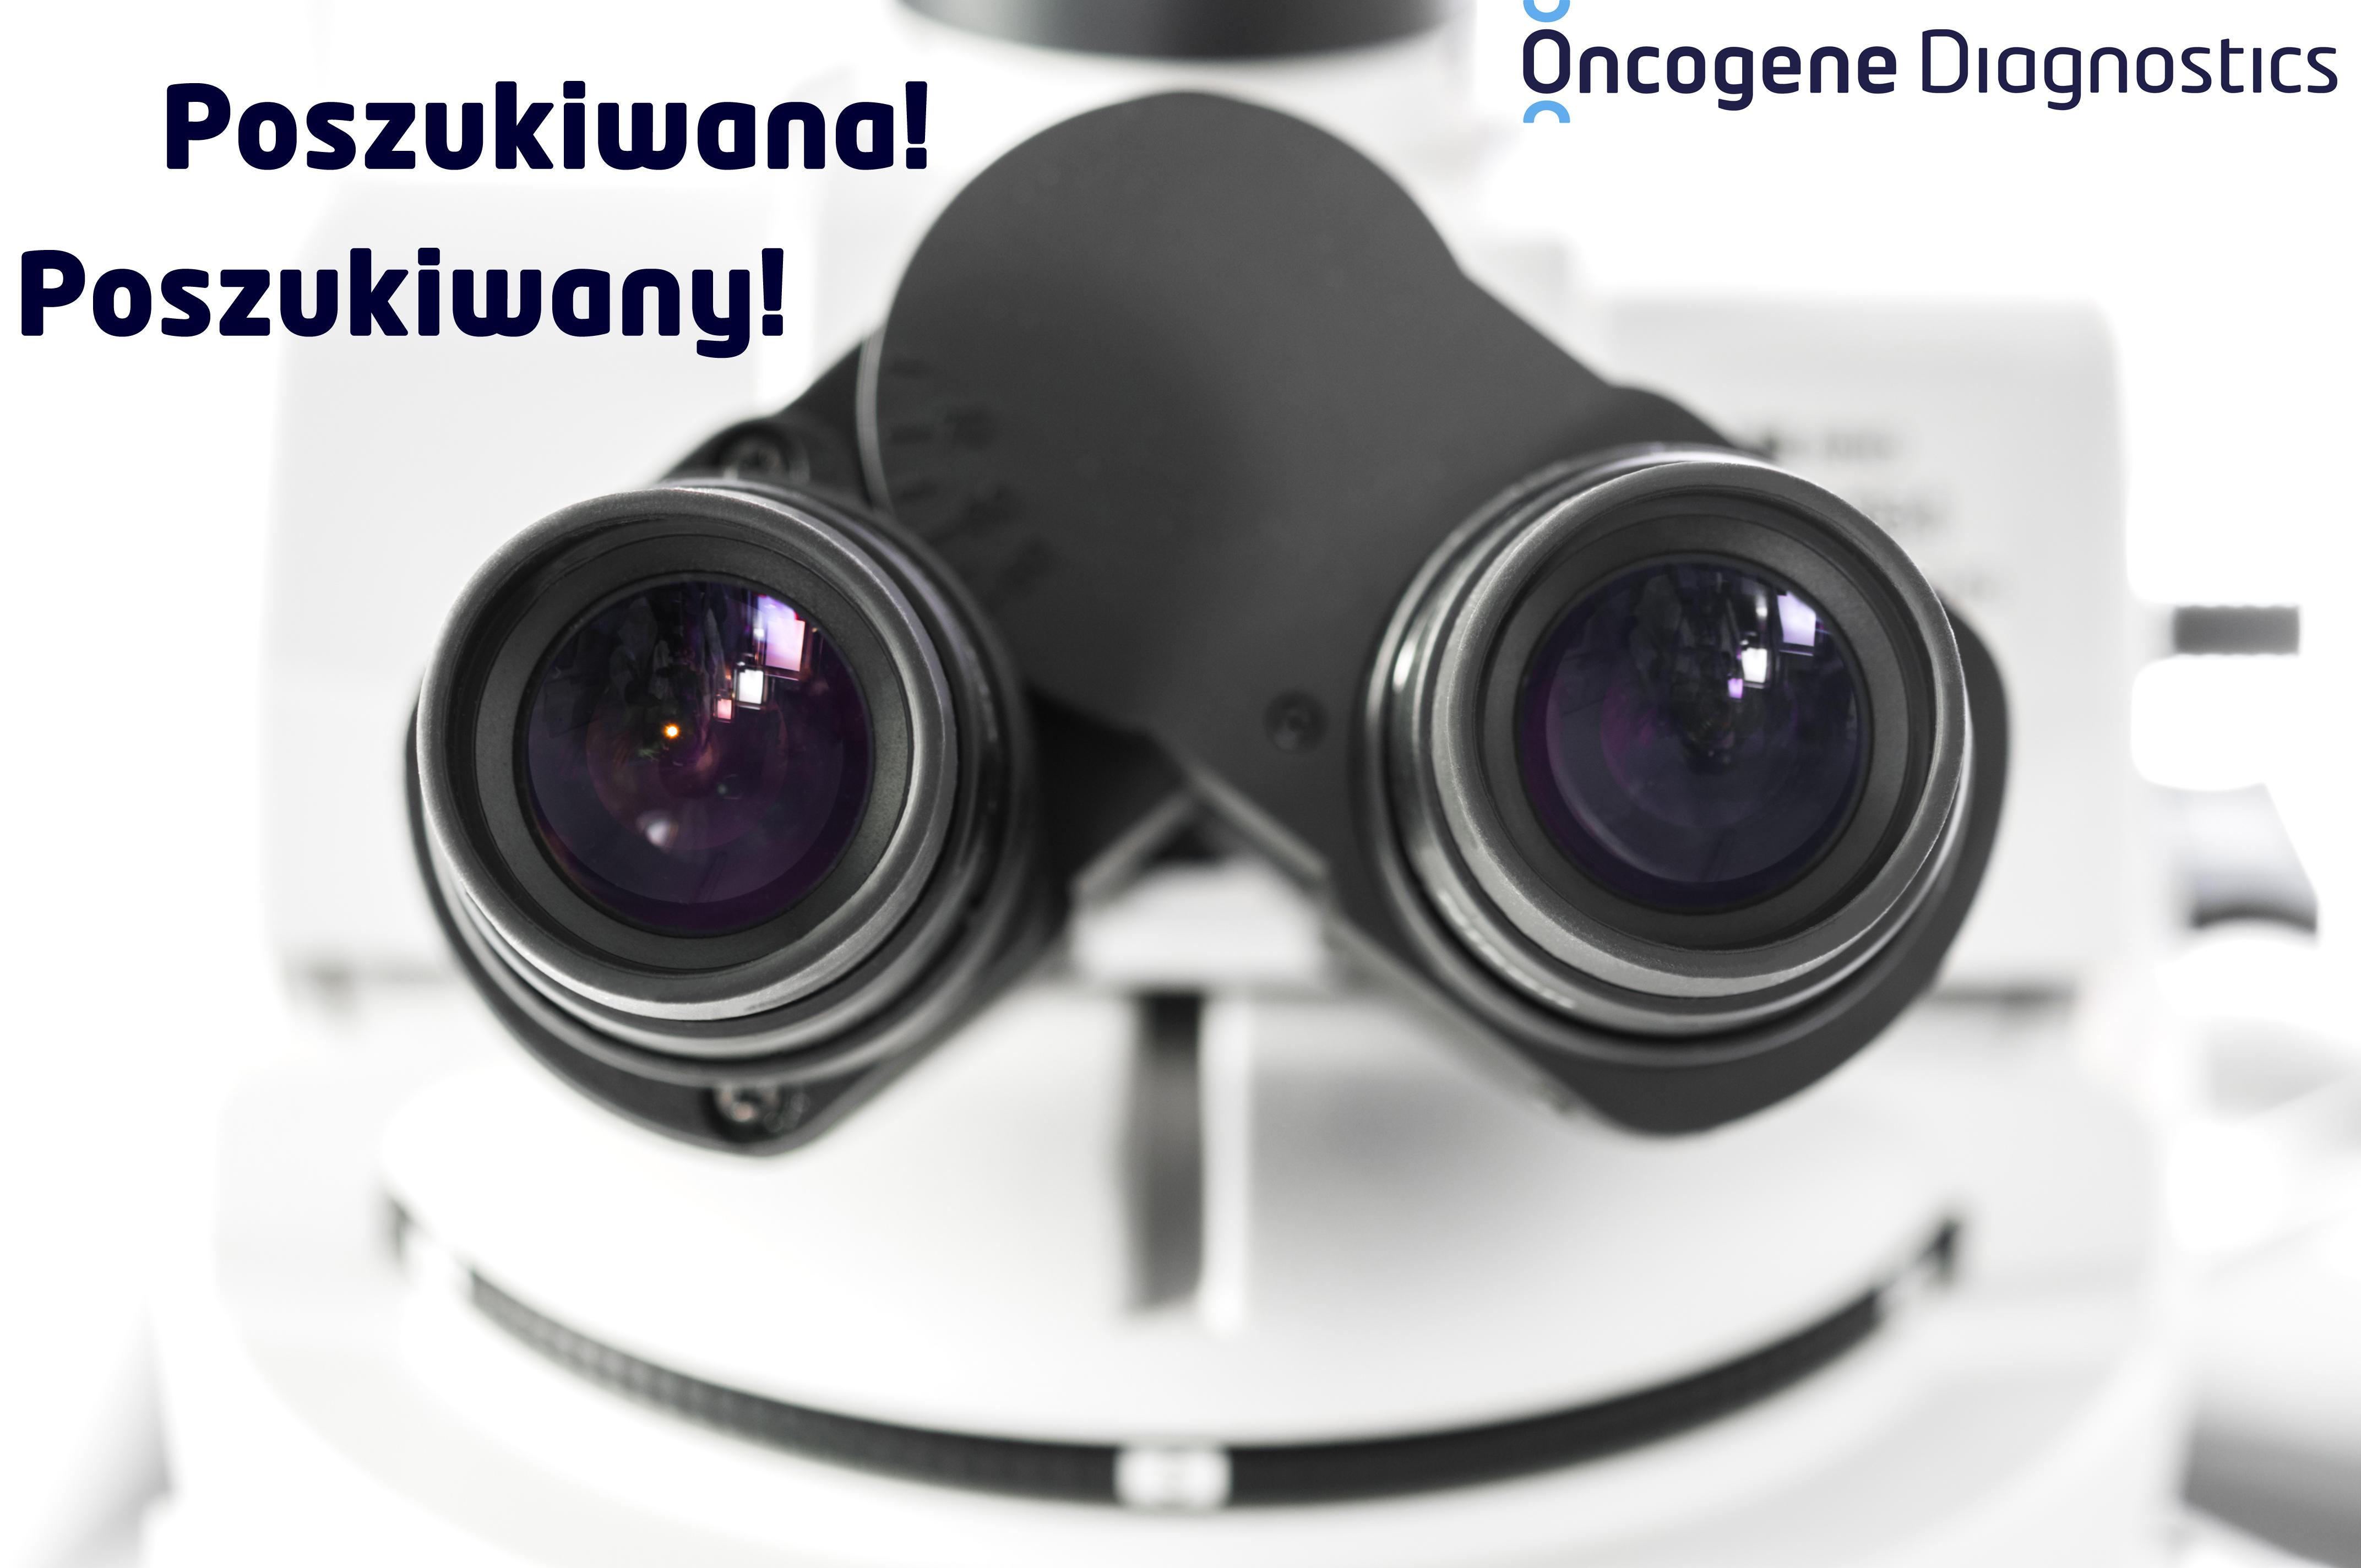 Oncogene Diagnostics - 17/03/2016